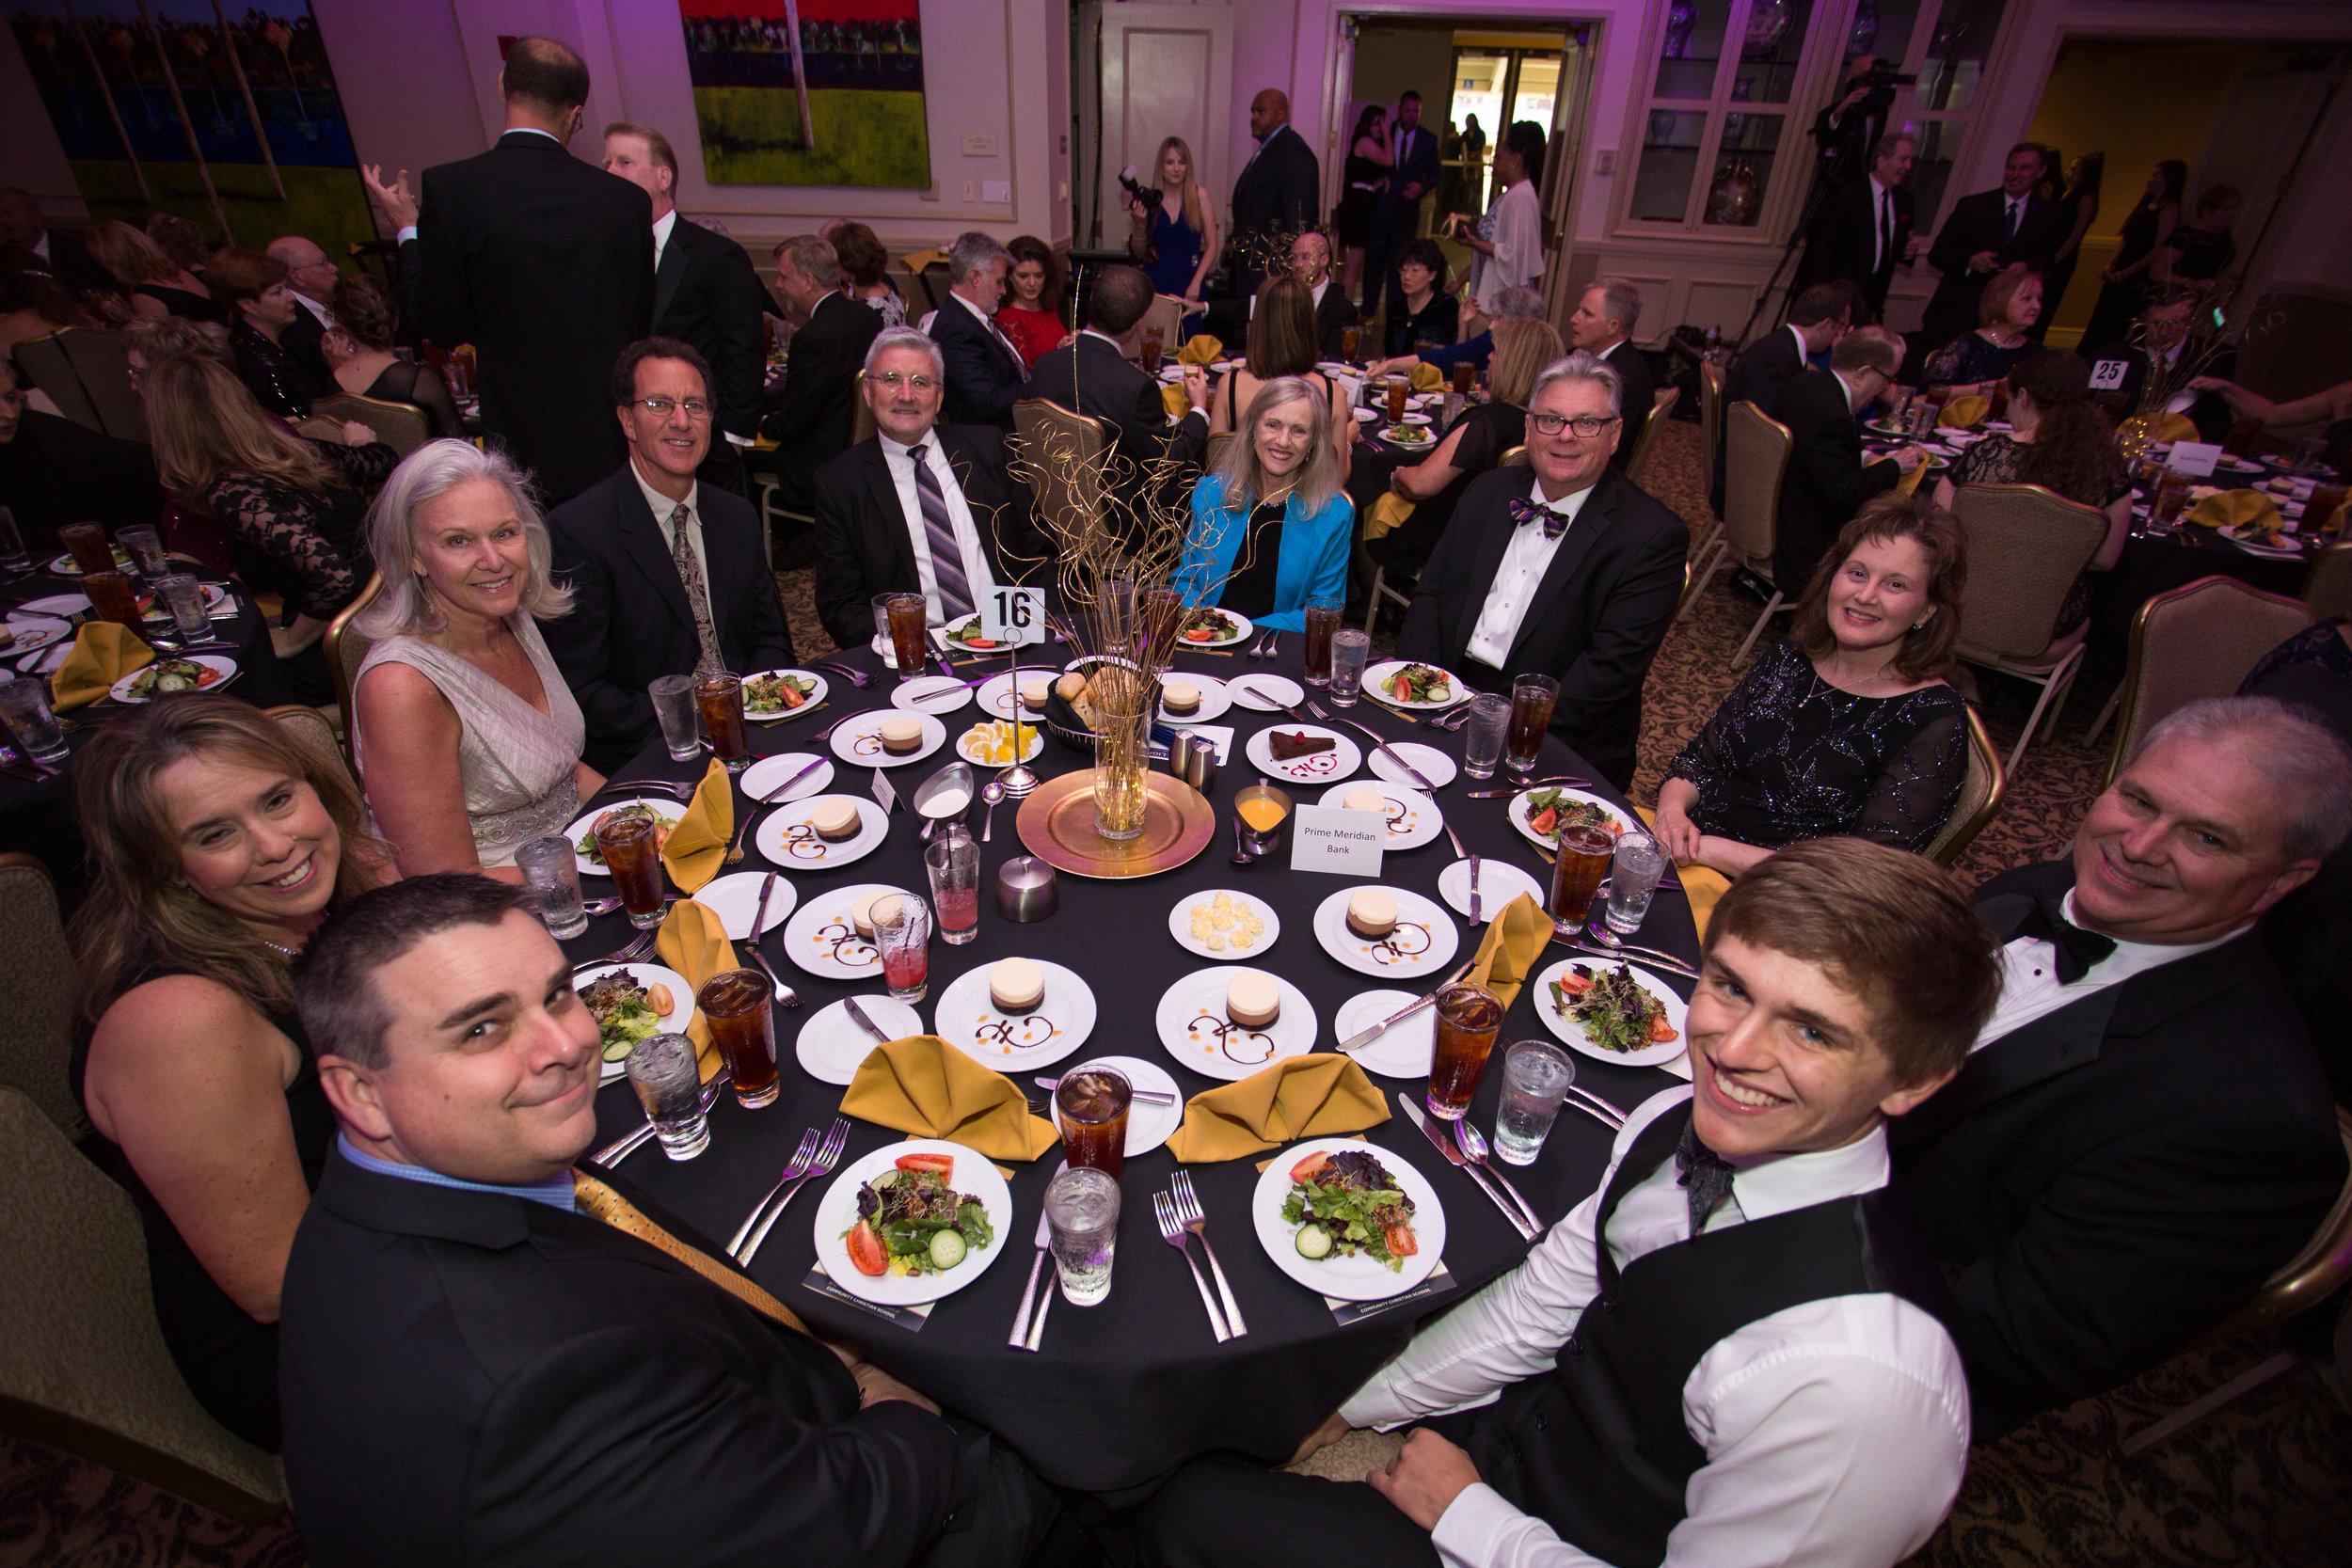 Celebrity guests TCC President and Mrs. Jim Murdaugh with gala sponsor Prime Meridian Bank